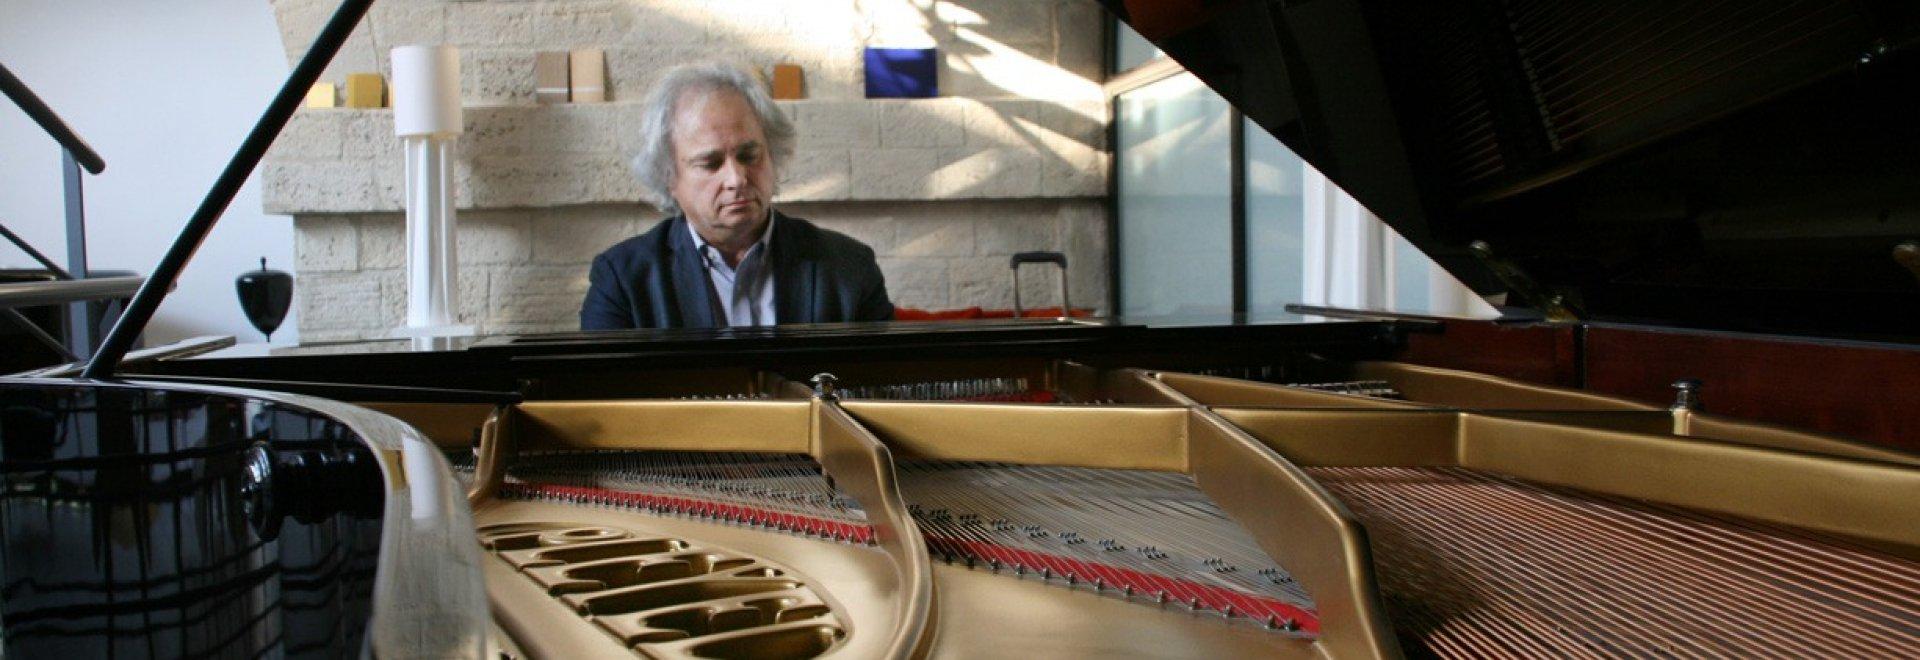 Rencontre avec le pianiste Yves Henry